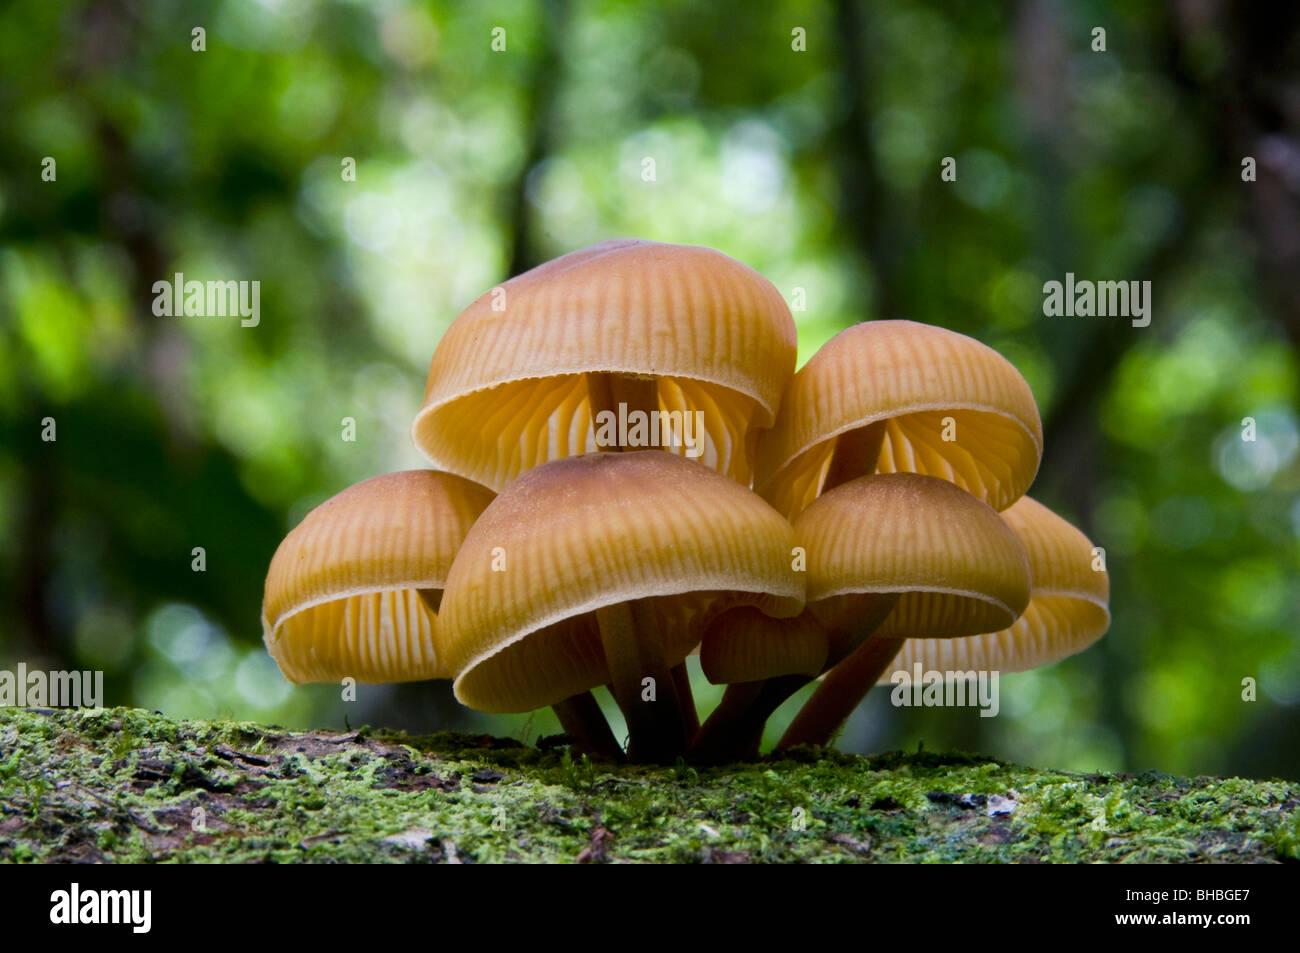 Mushrooms on fallen rainforest log, Camp 1, Marojejy National Park, Madagascar - Stock Image